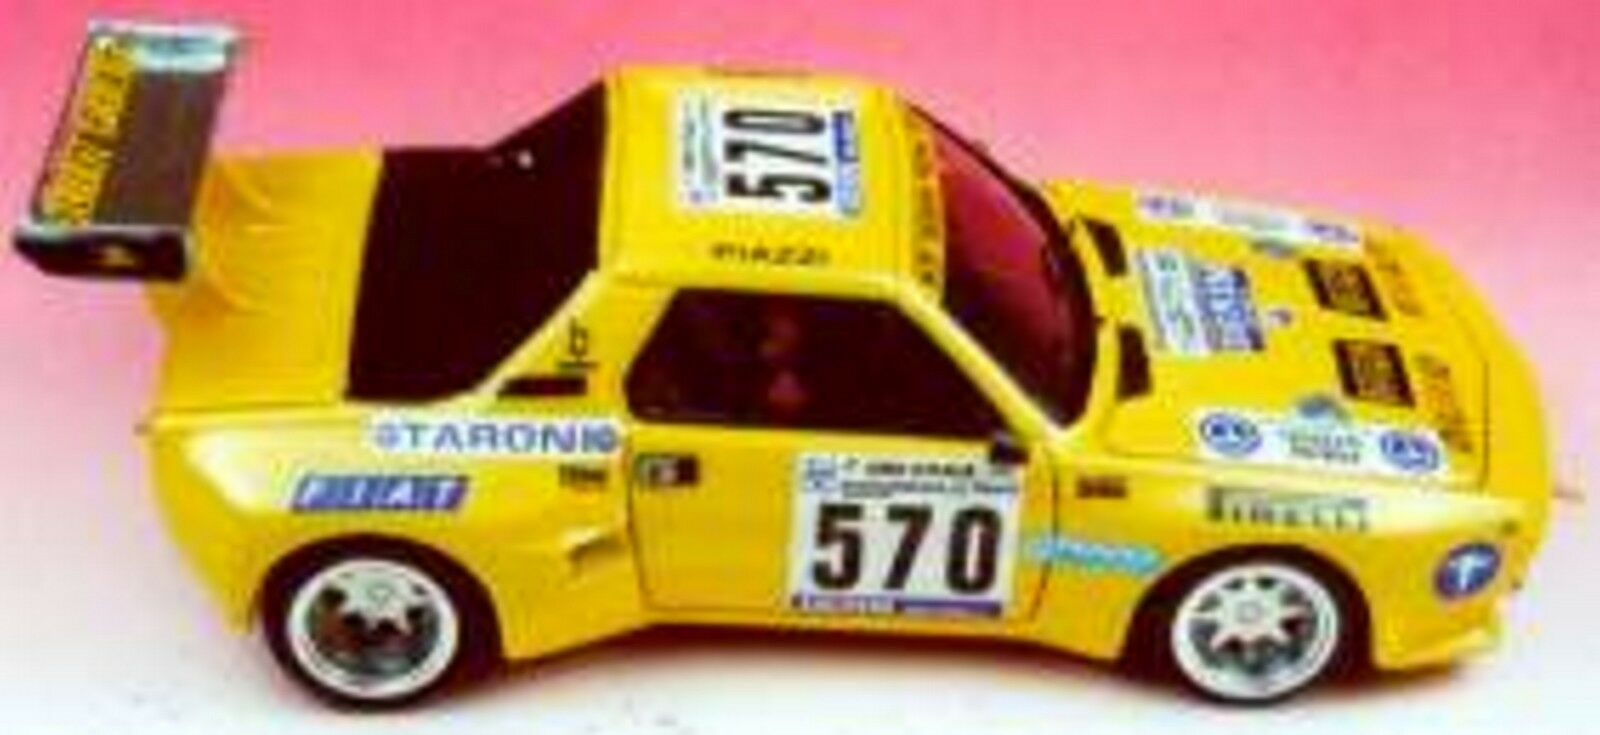 +kit Fiat X 1 9 Piazzi-Zorzi Giro d'Italia 1979 - Arena Models kit 1 43